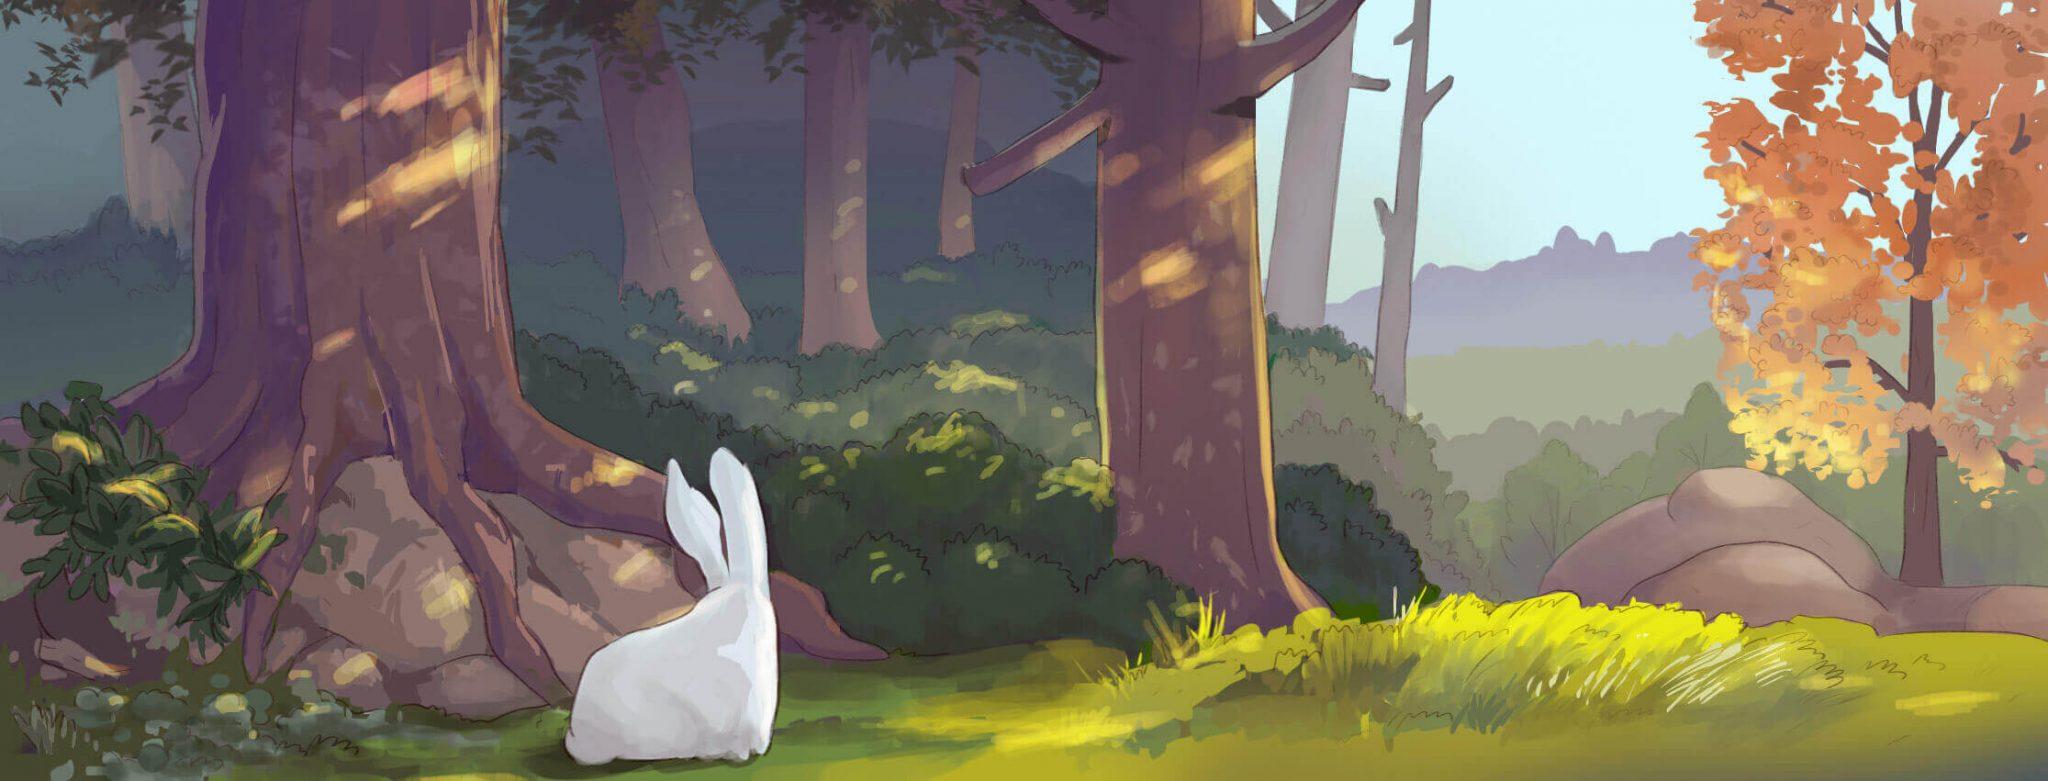 Whimsical Bunny Landscape